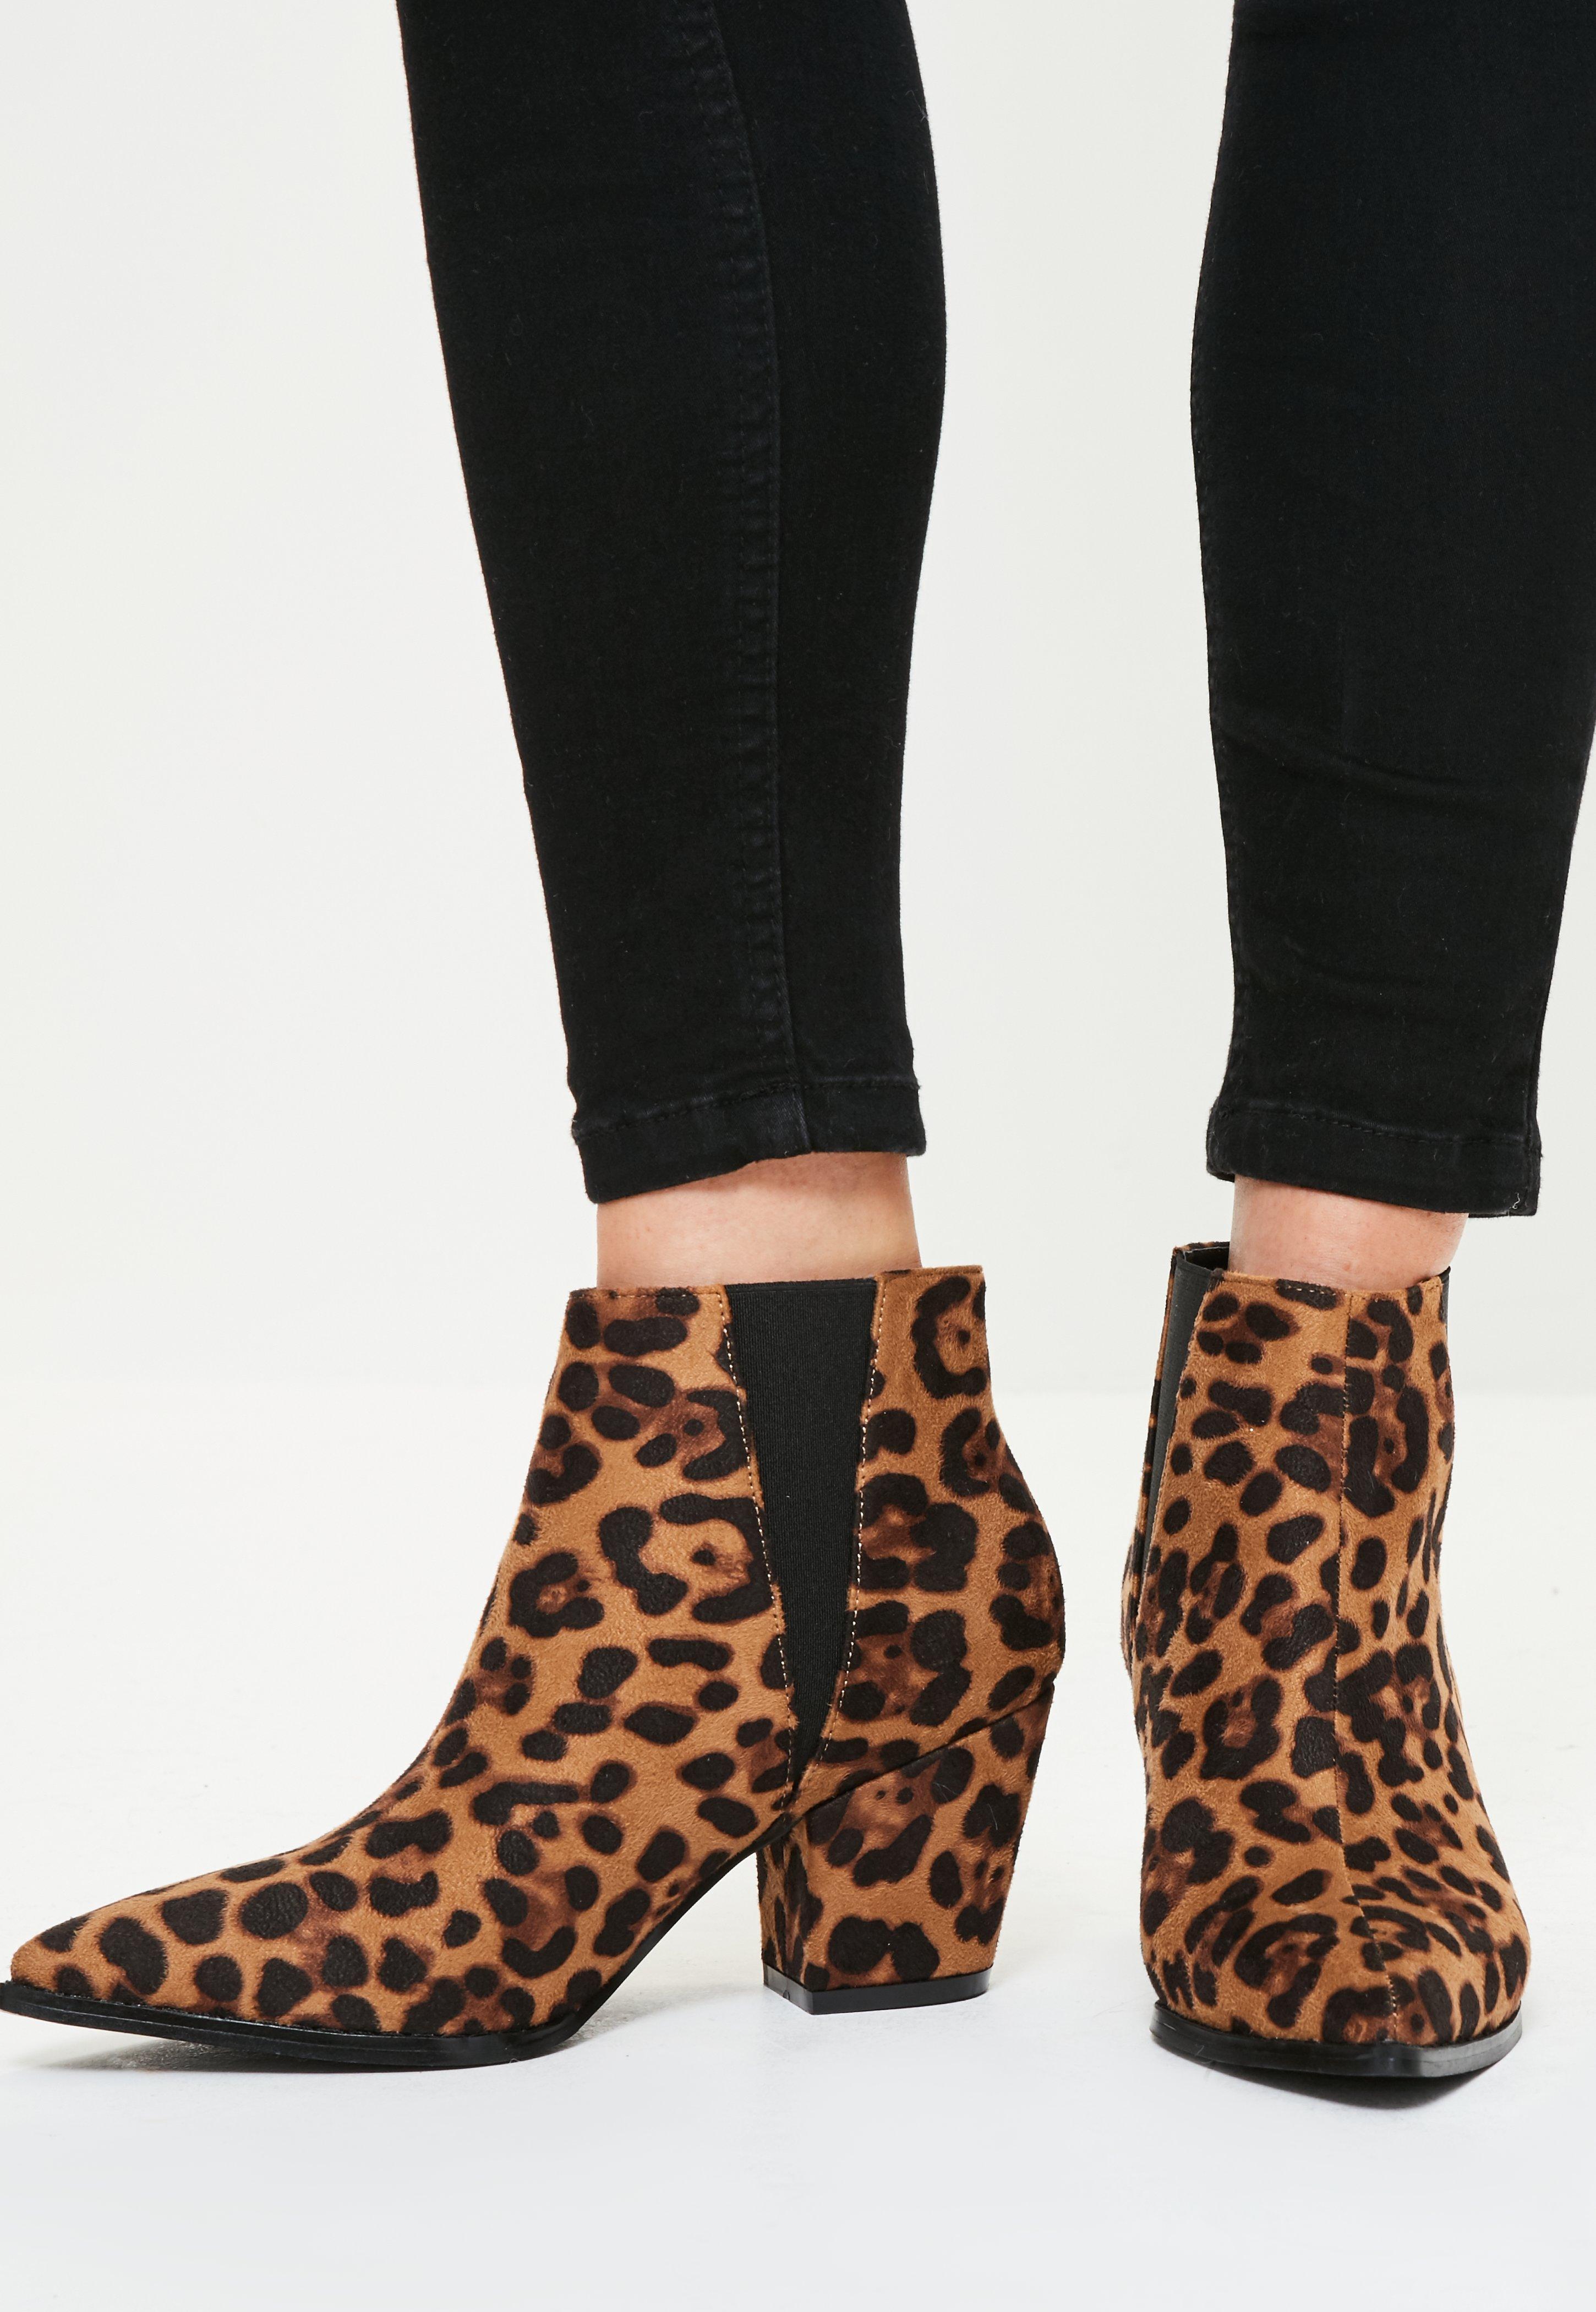 Snake Print Stiletto Heel Side Zipper Color Block Pointed